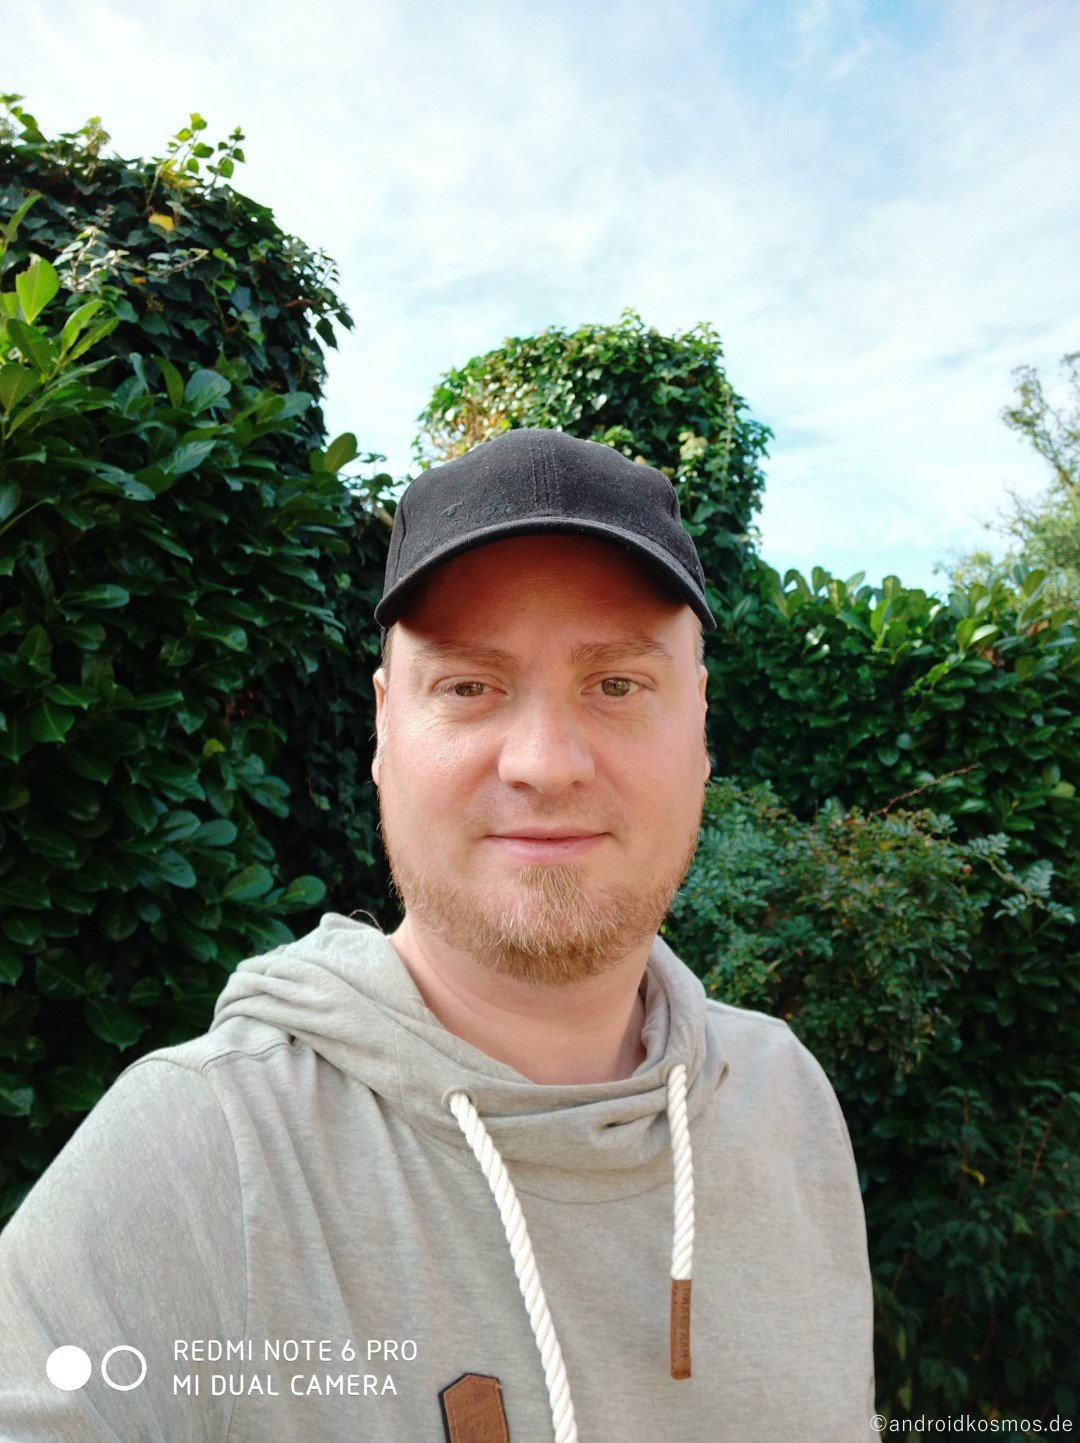 Redmi Note 6 Pro Selfie